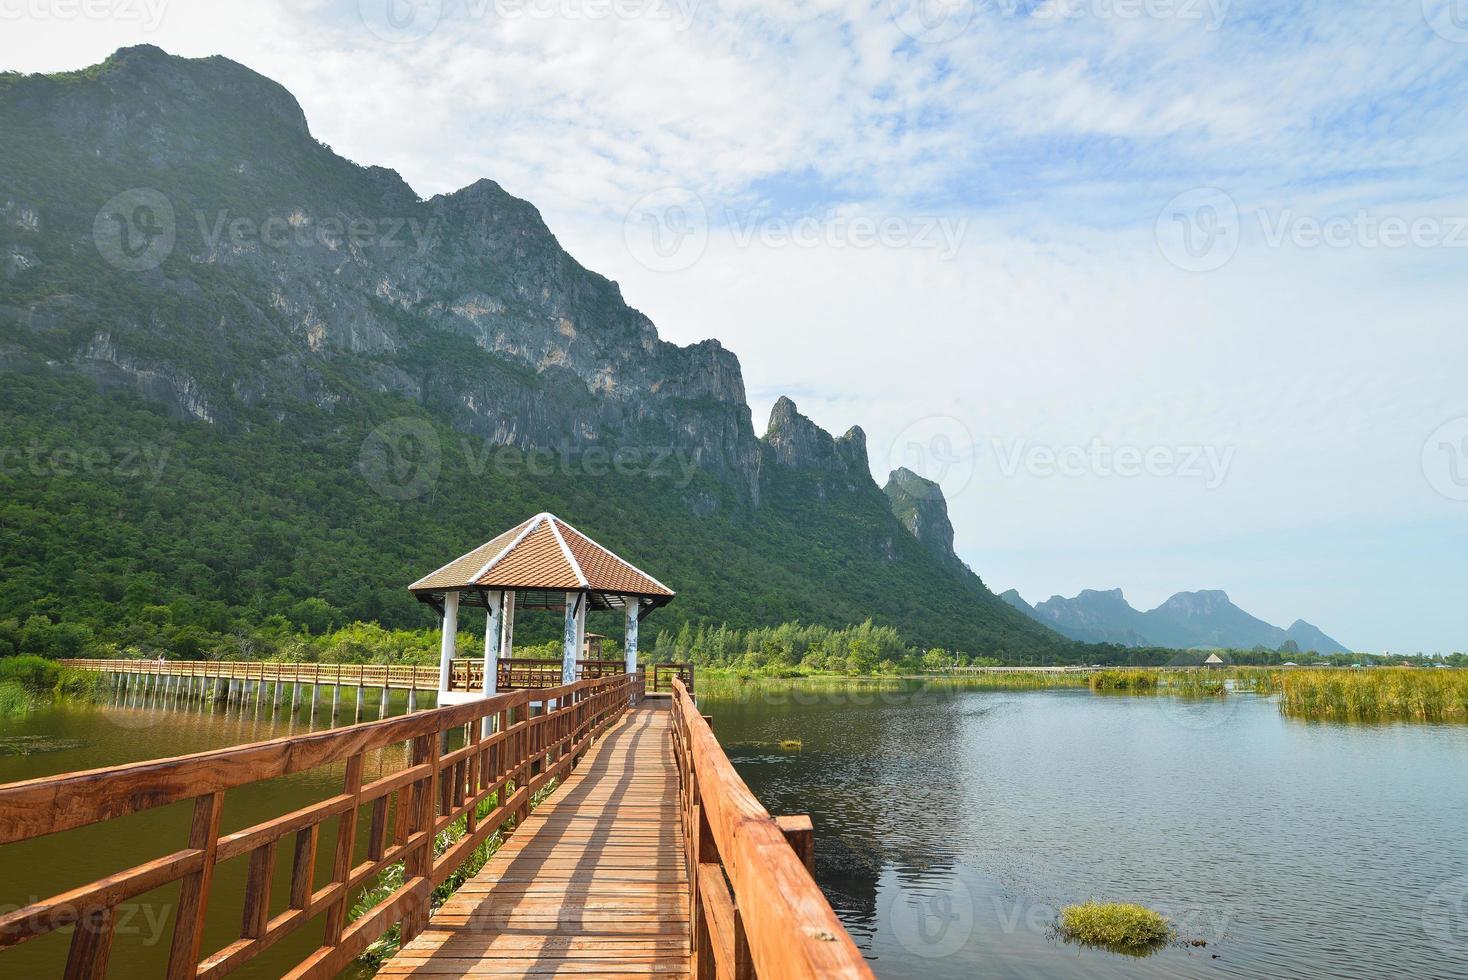 houten brug in lotusmeer bij khao sam roi yod foto